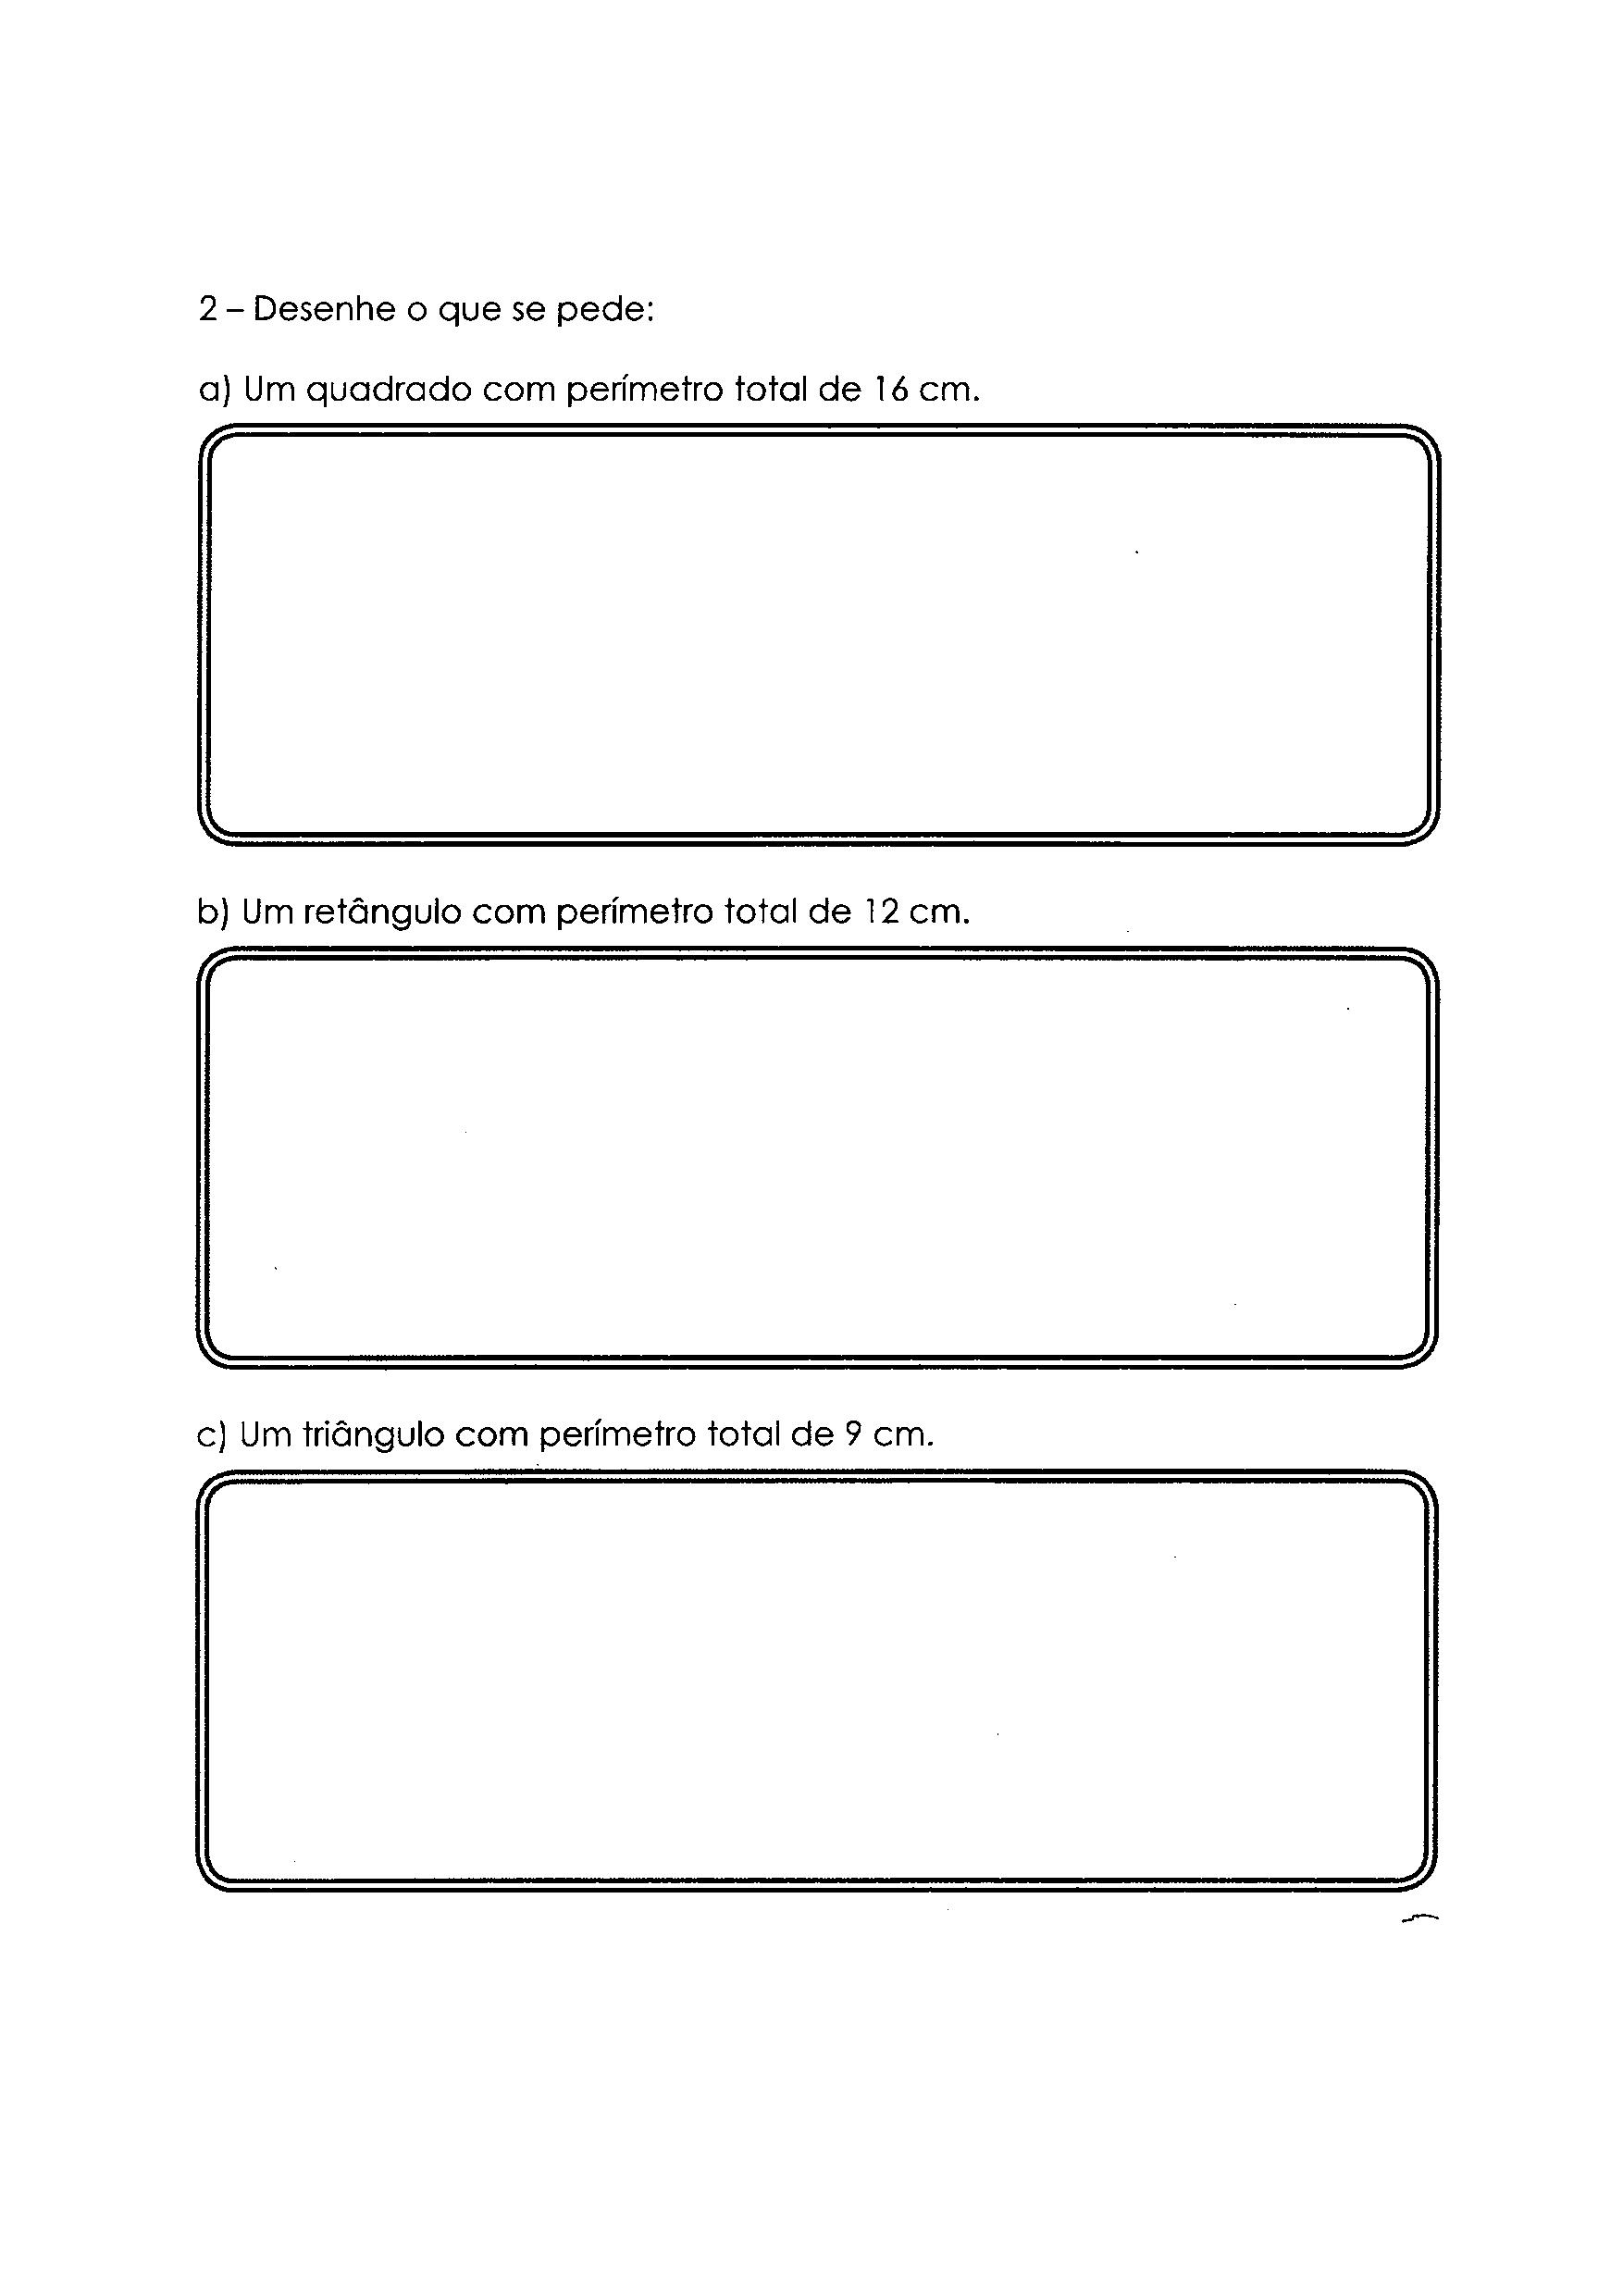 Perímetro - Atividade 2